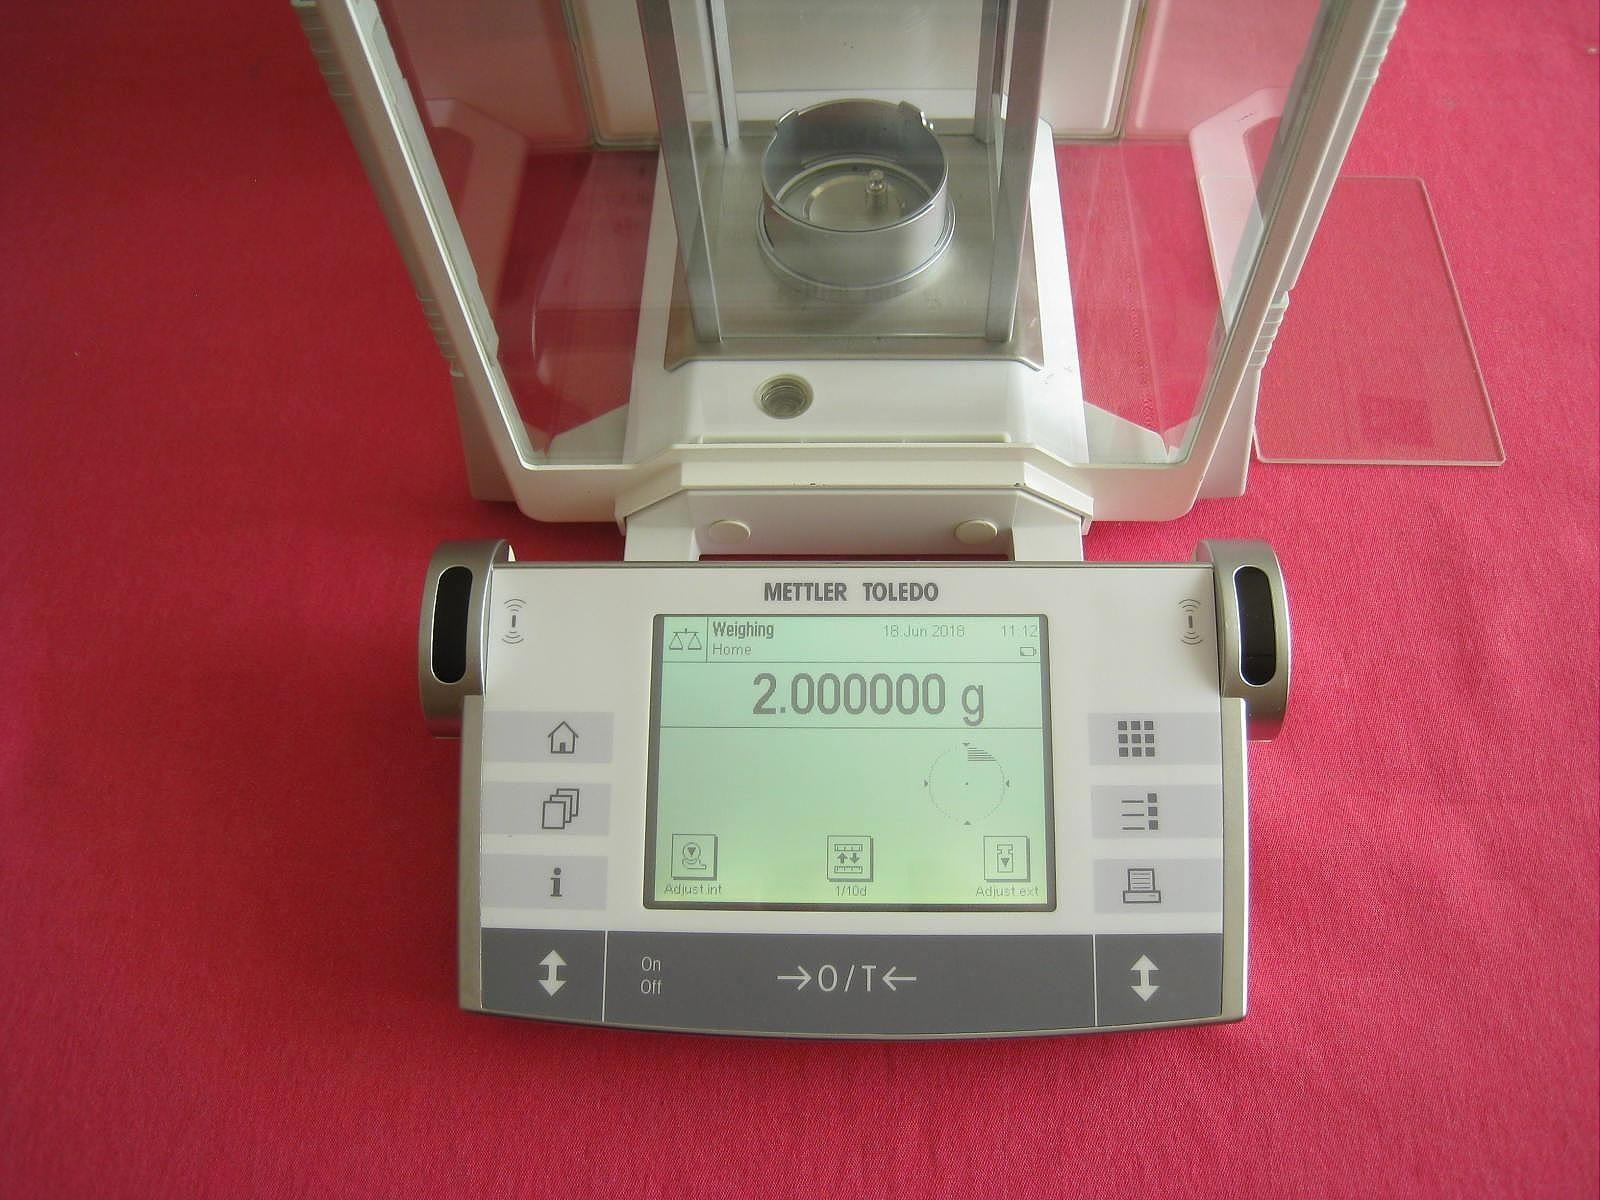 Mettler Toledo AX26 Microbalance 3.000000g / 21.00000g